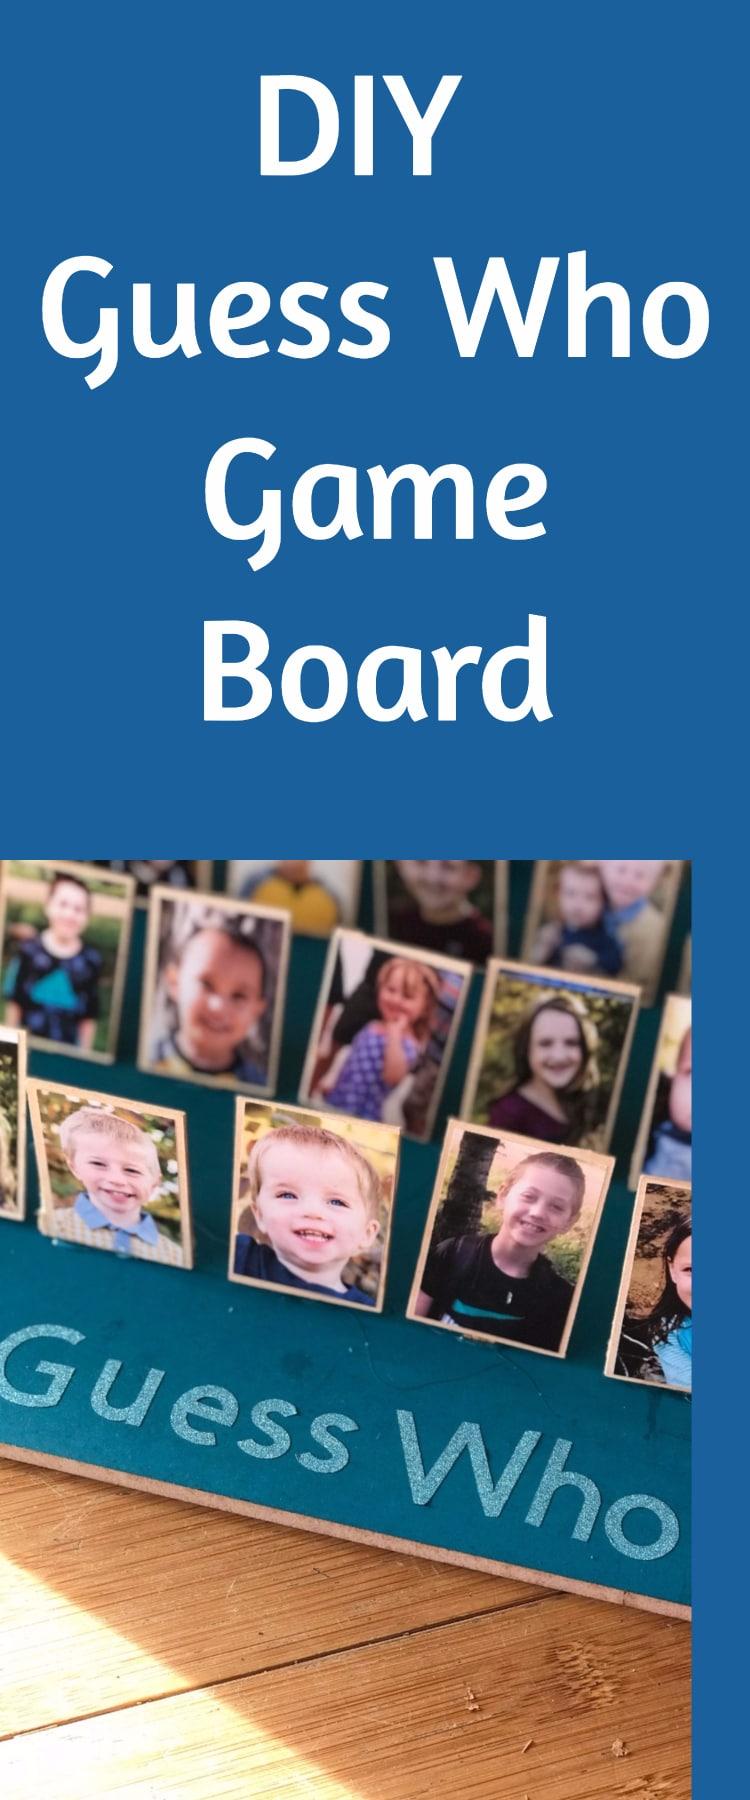 DIY Guess Who Board Game Tutorial / DIY Gift Ideas / #Christmas / Christmas Project / Cricut Projects / Cricut Explore Air / Cricut Maker #Cricut via @clarkscondensed